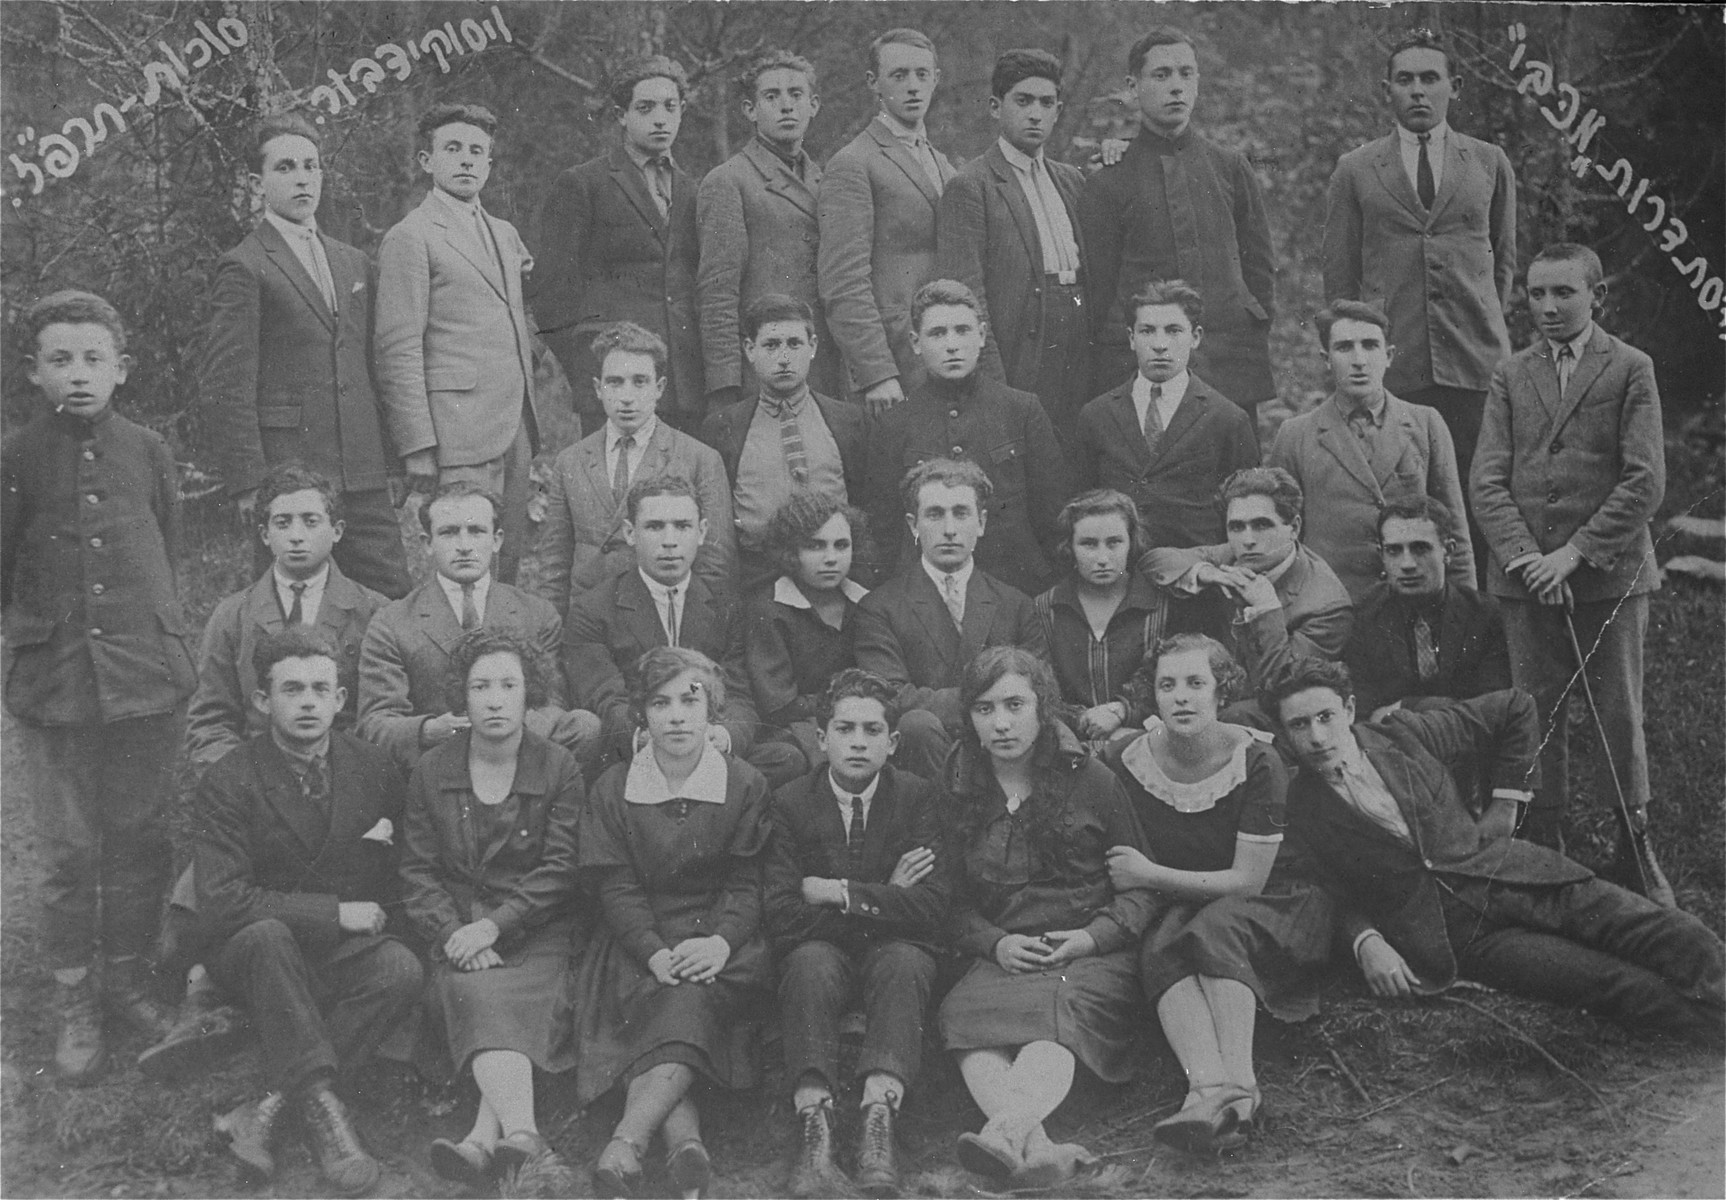 Group portrait of members of the Maccabi sports organization in Visokidbor, Lithuania, taken on the Jewish holiday of Sukkot.